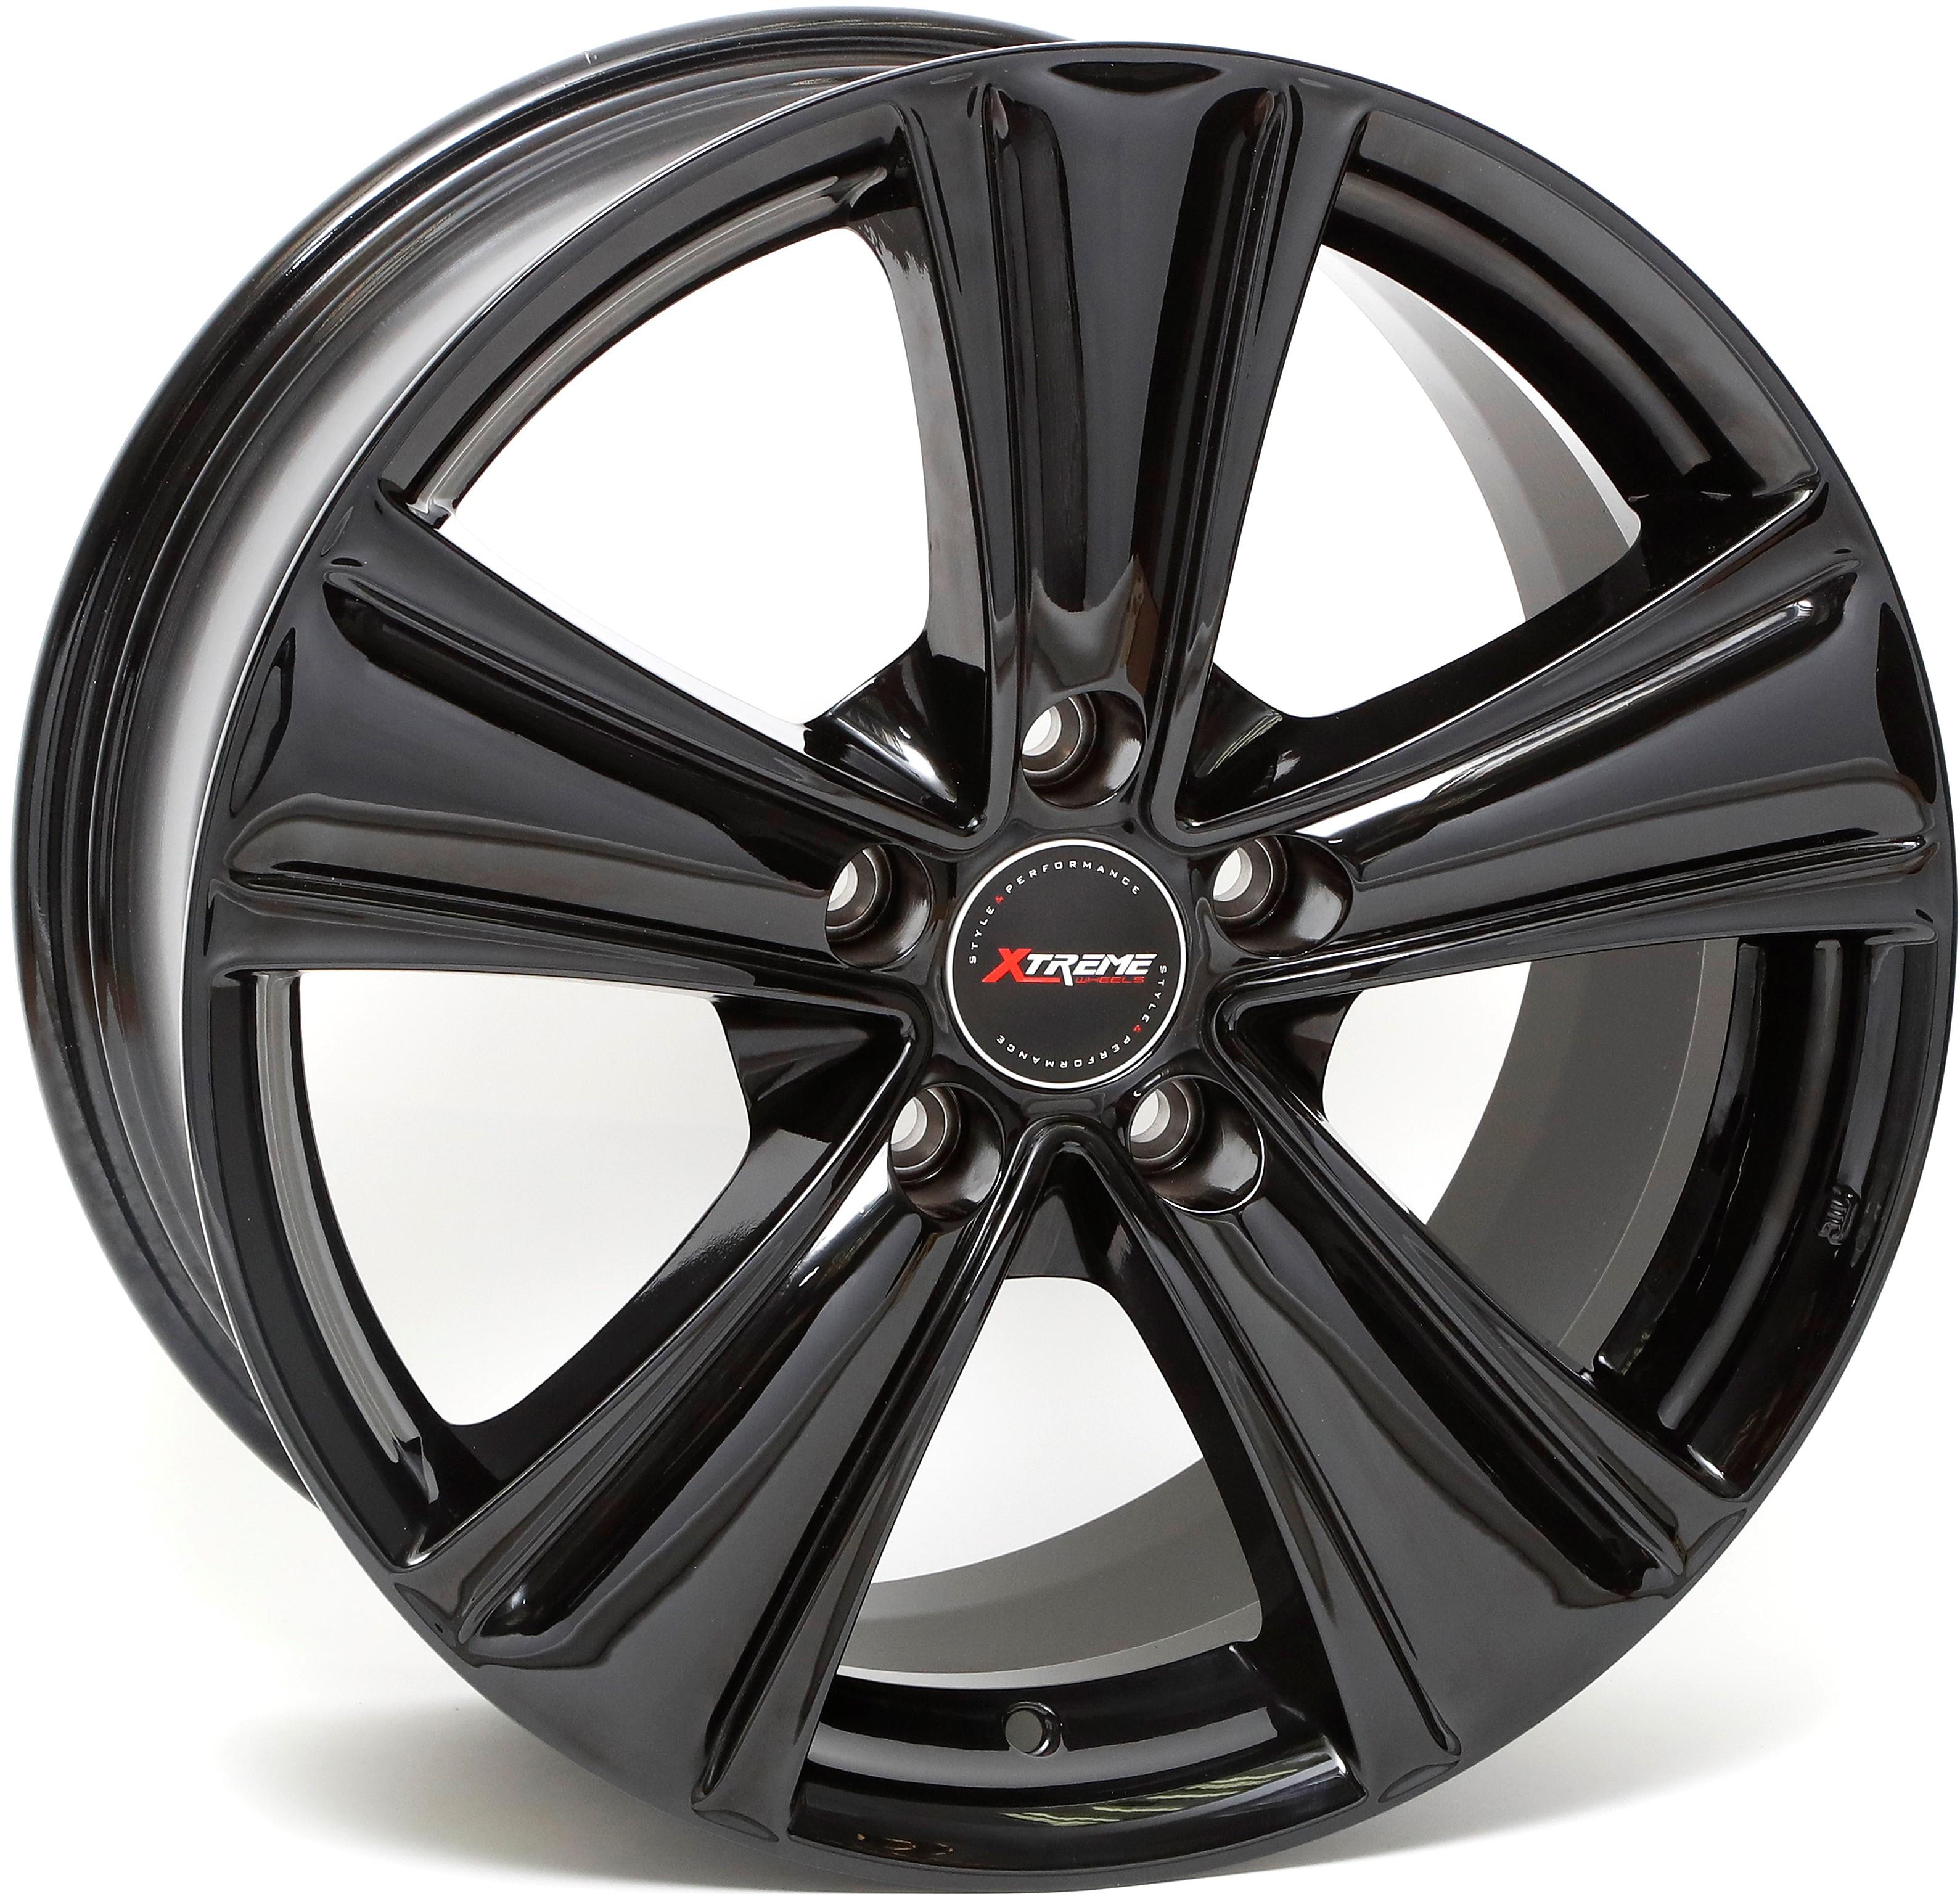 Xtreme - X90 (Gloss Black)